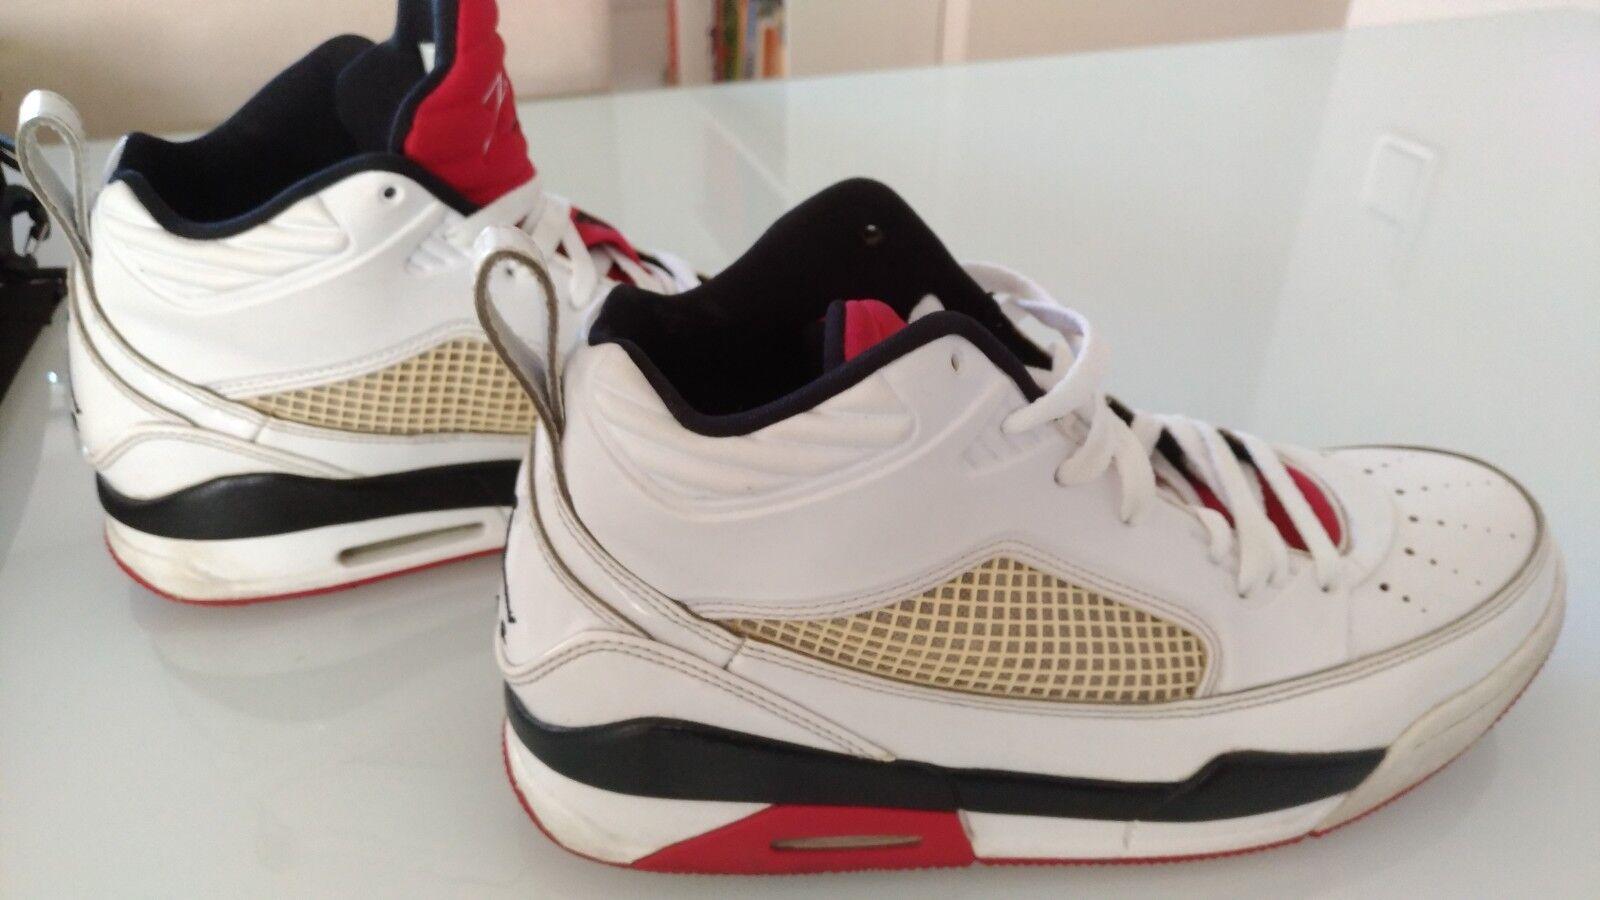 Nike Jordan Schuhe, Flight Schuhe, Jordan top Zustand, Gr. 44 20476f